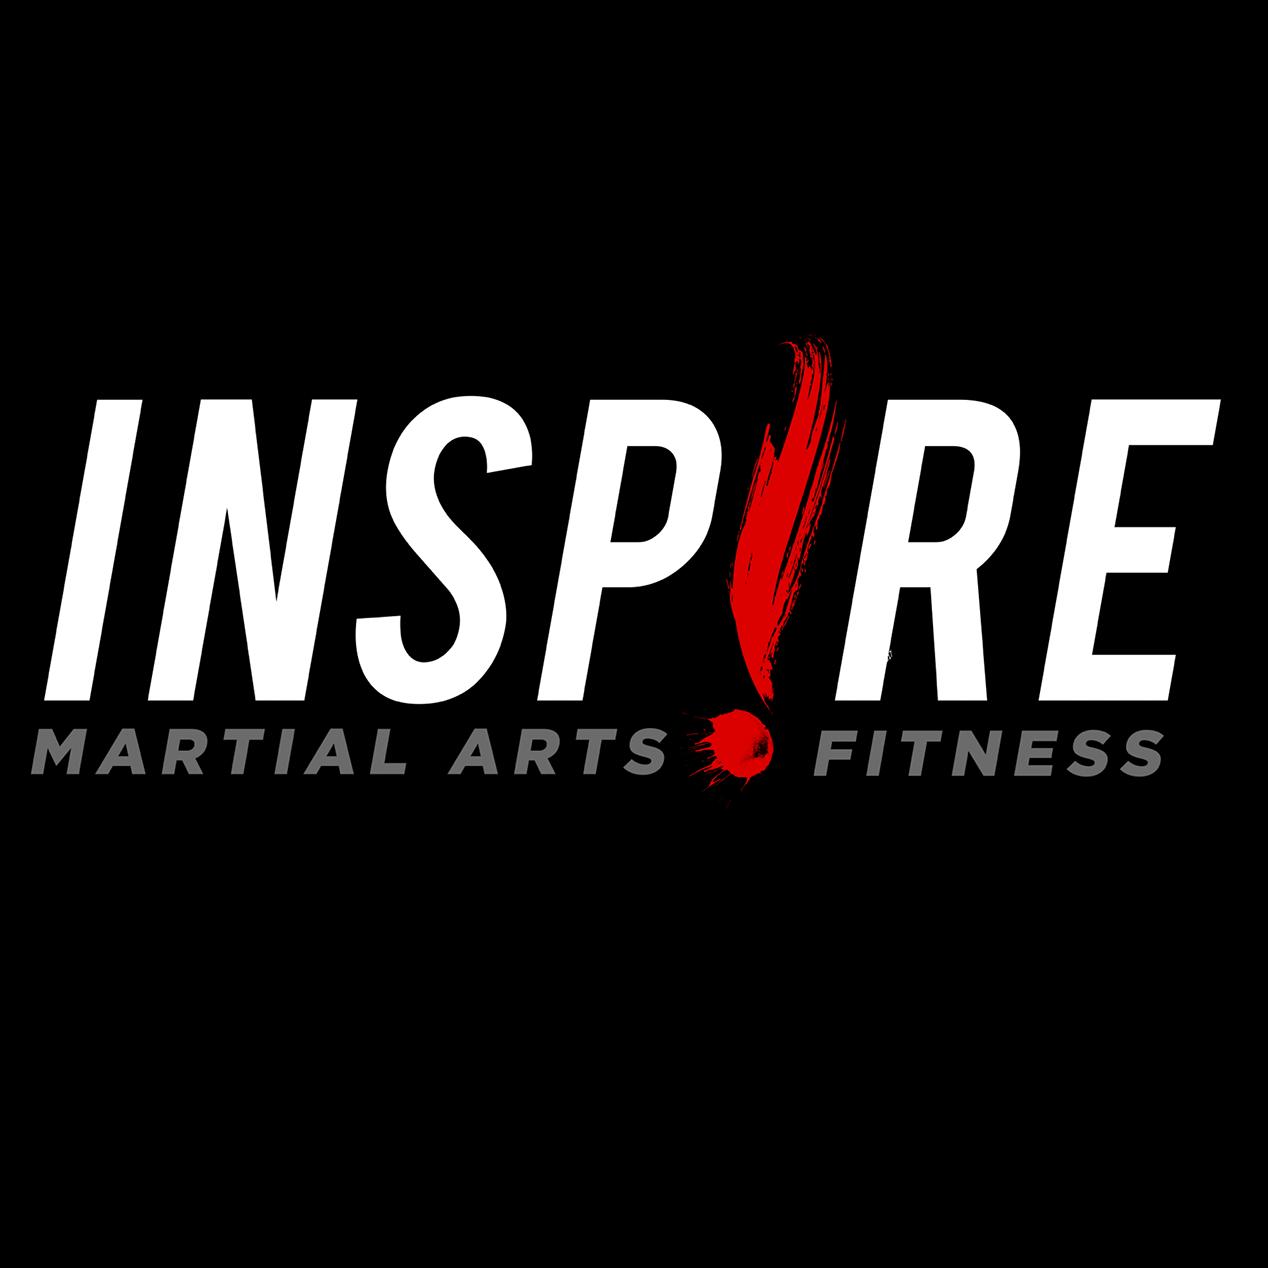 Inspire Martial Arts